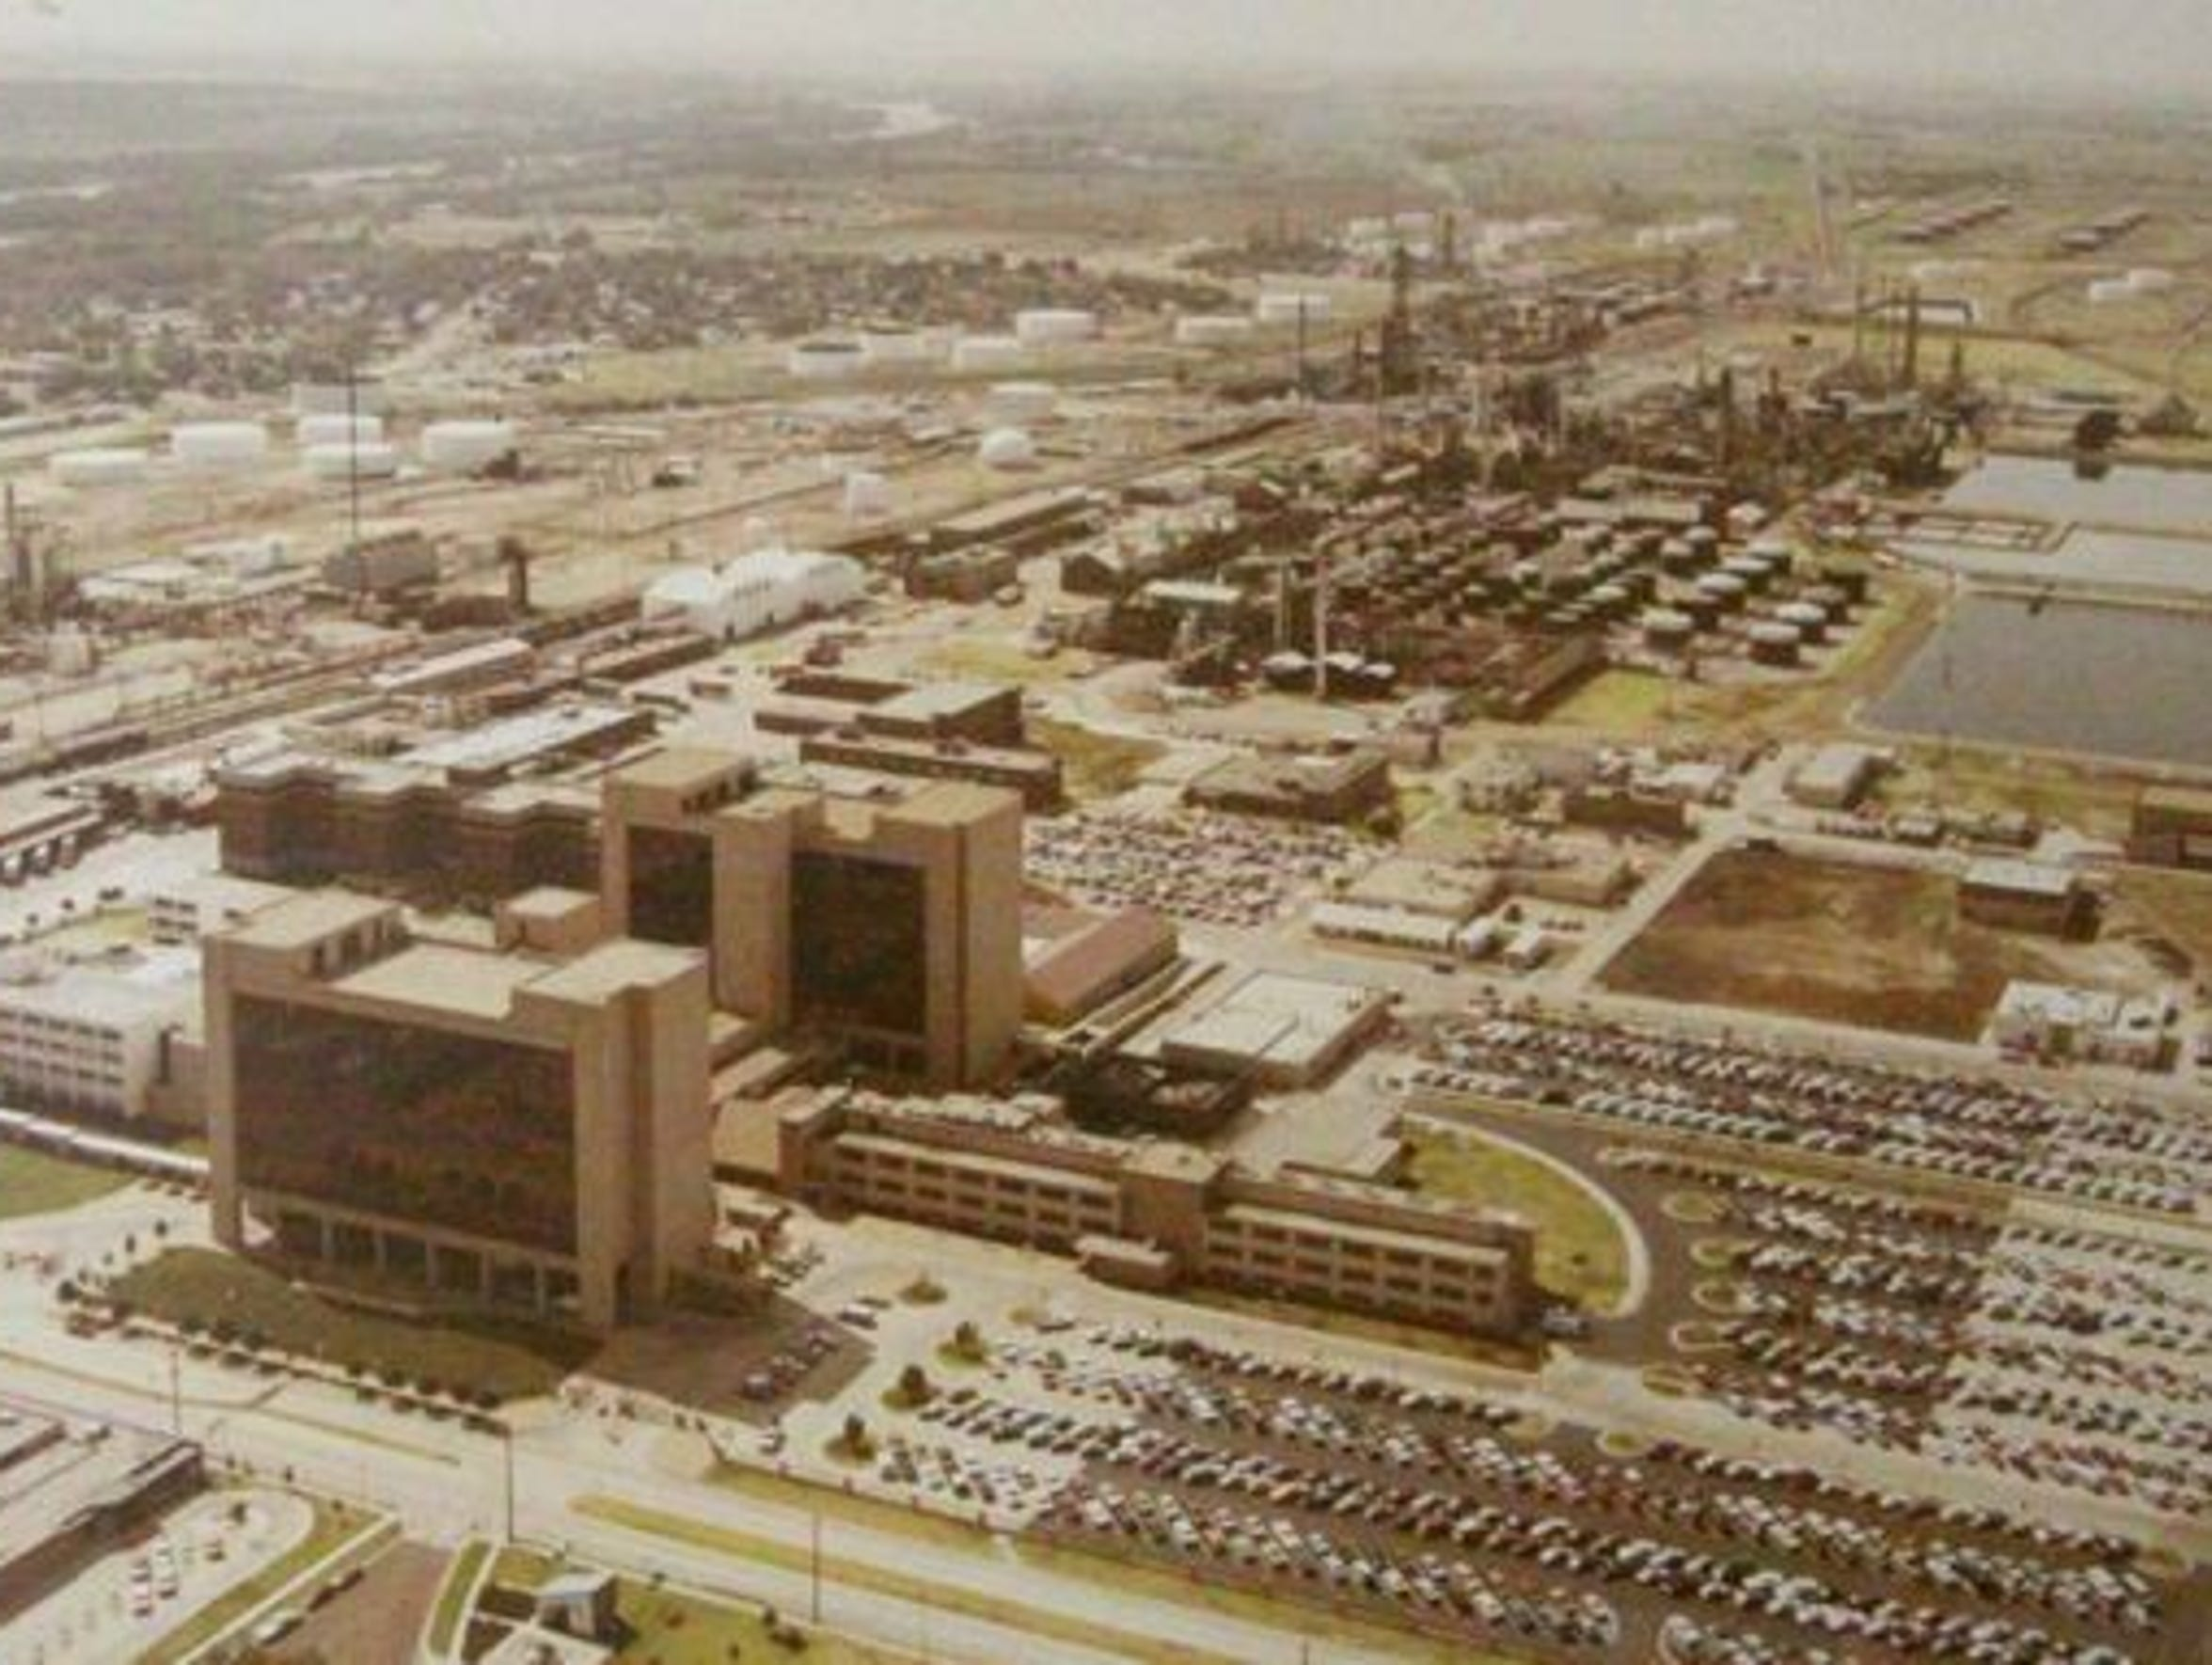 ConocoPhillips' Ponca City, Oklahoma plant is seen